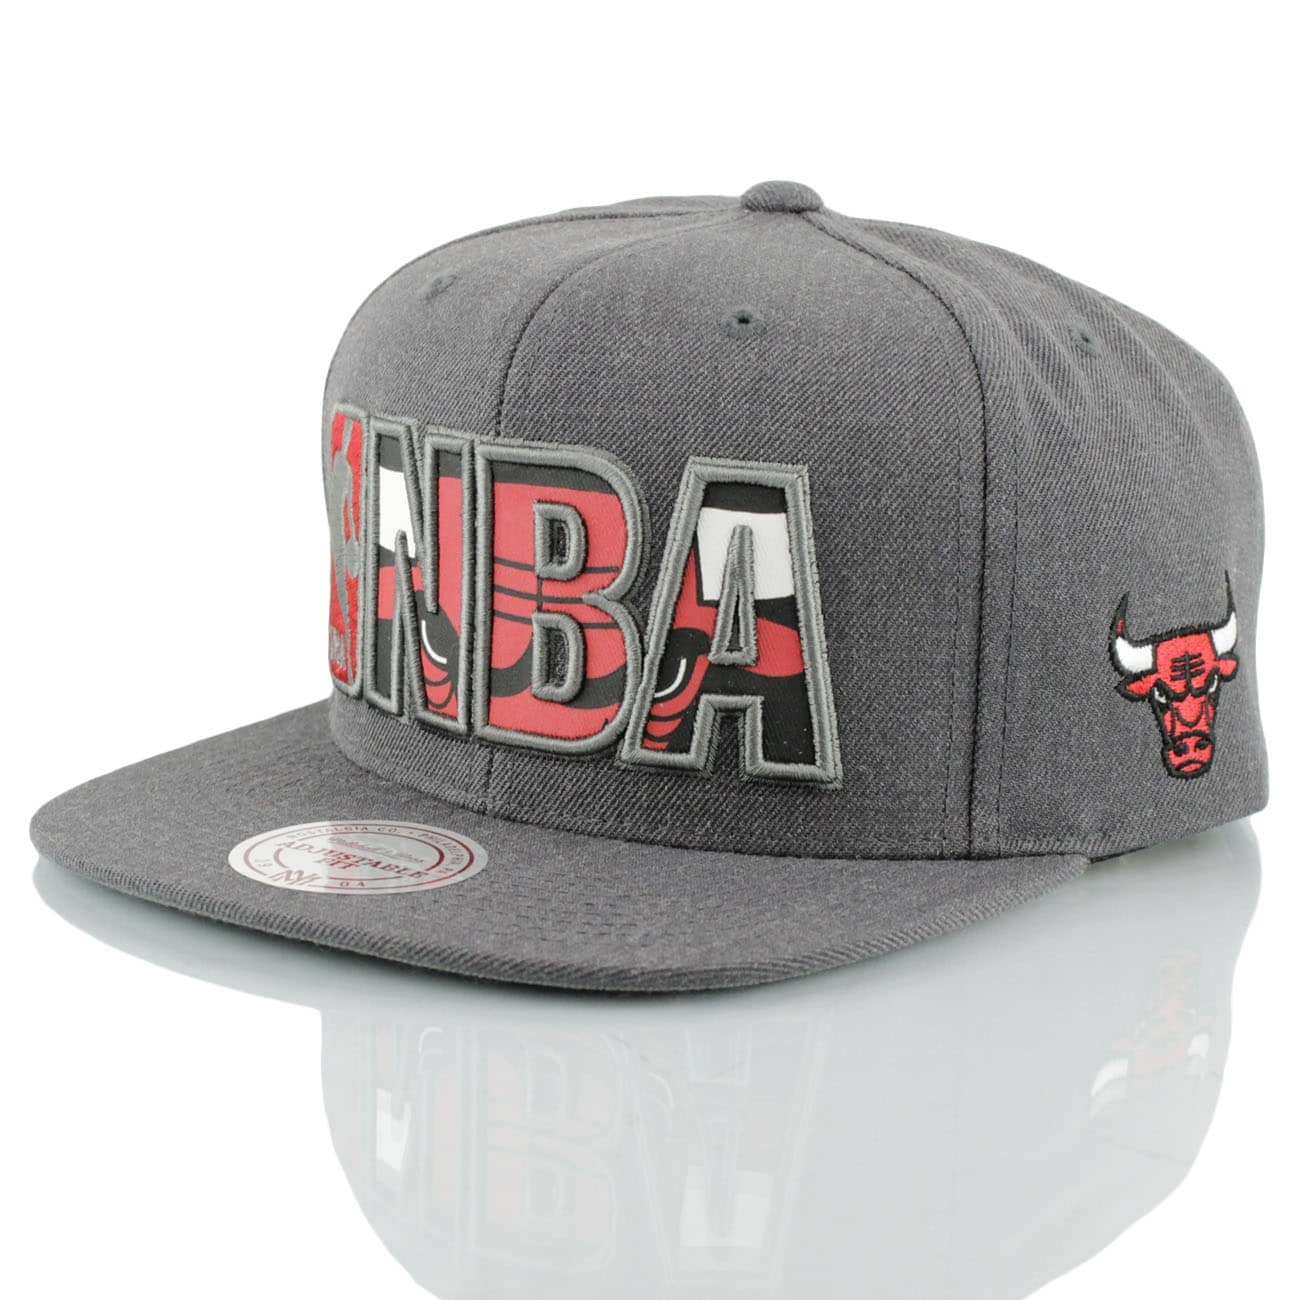 sports shoes c0d07 3c885 Mitchell   Ness Chicago Bulls Insider Reflective Snapback NBA Cap    TAASS.com Fan Shop